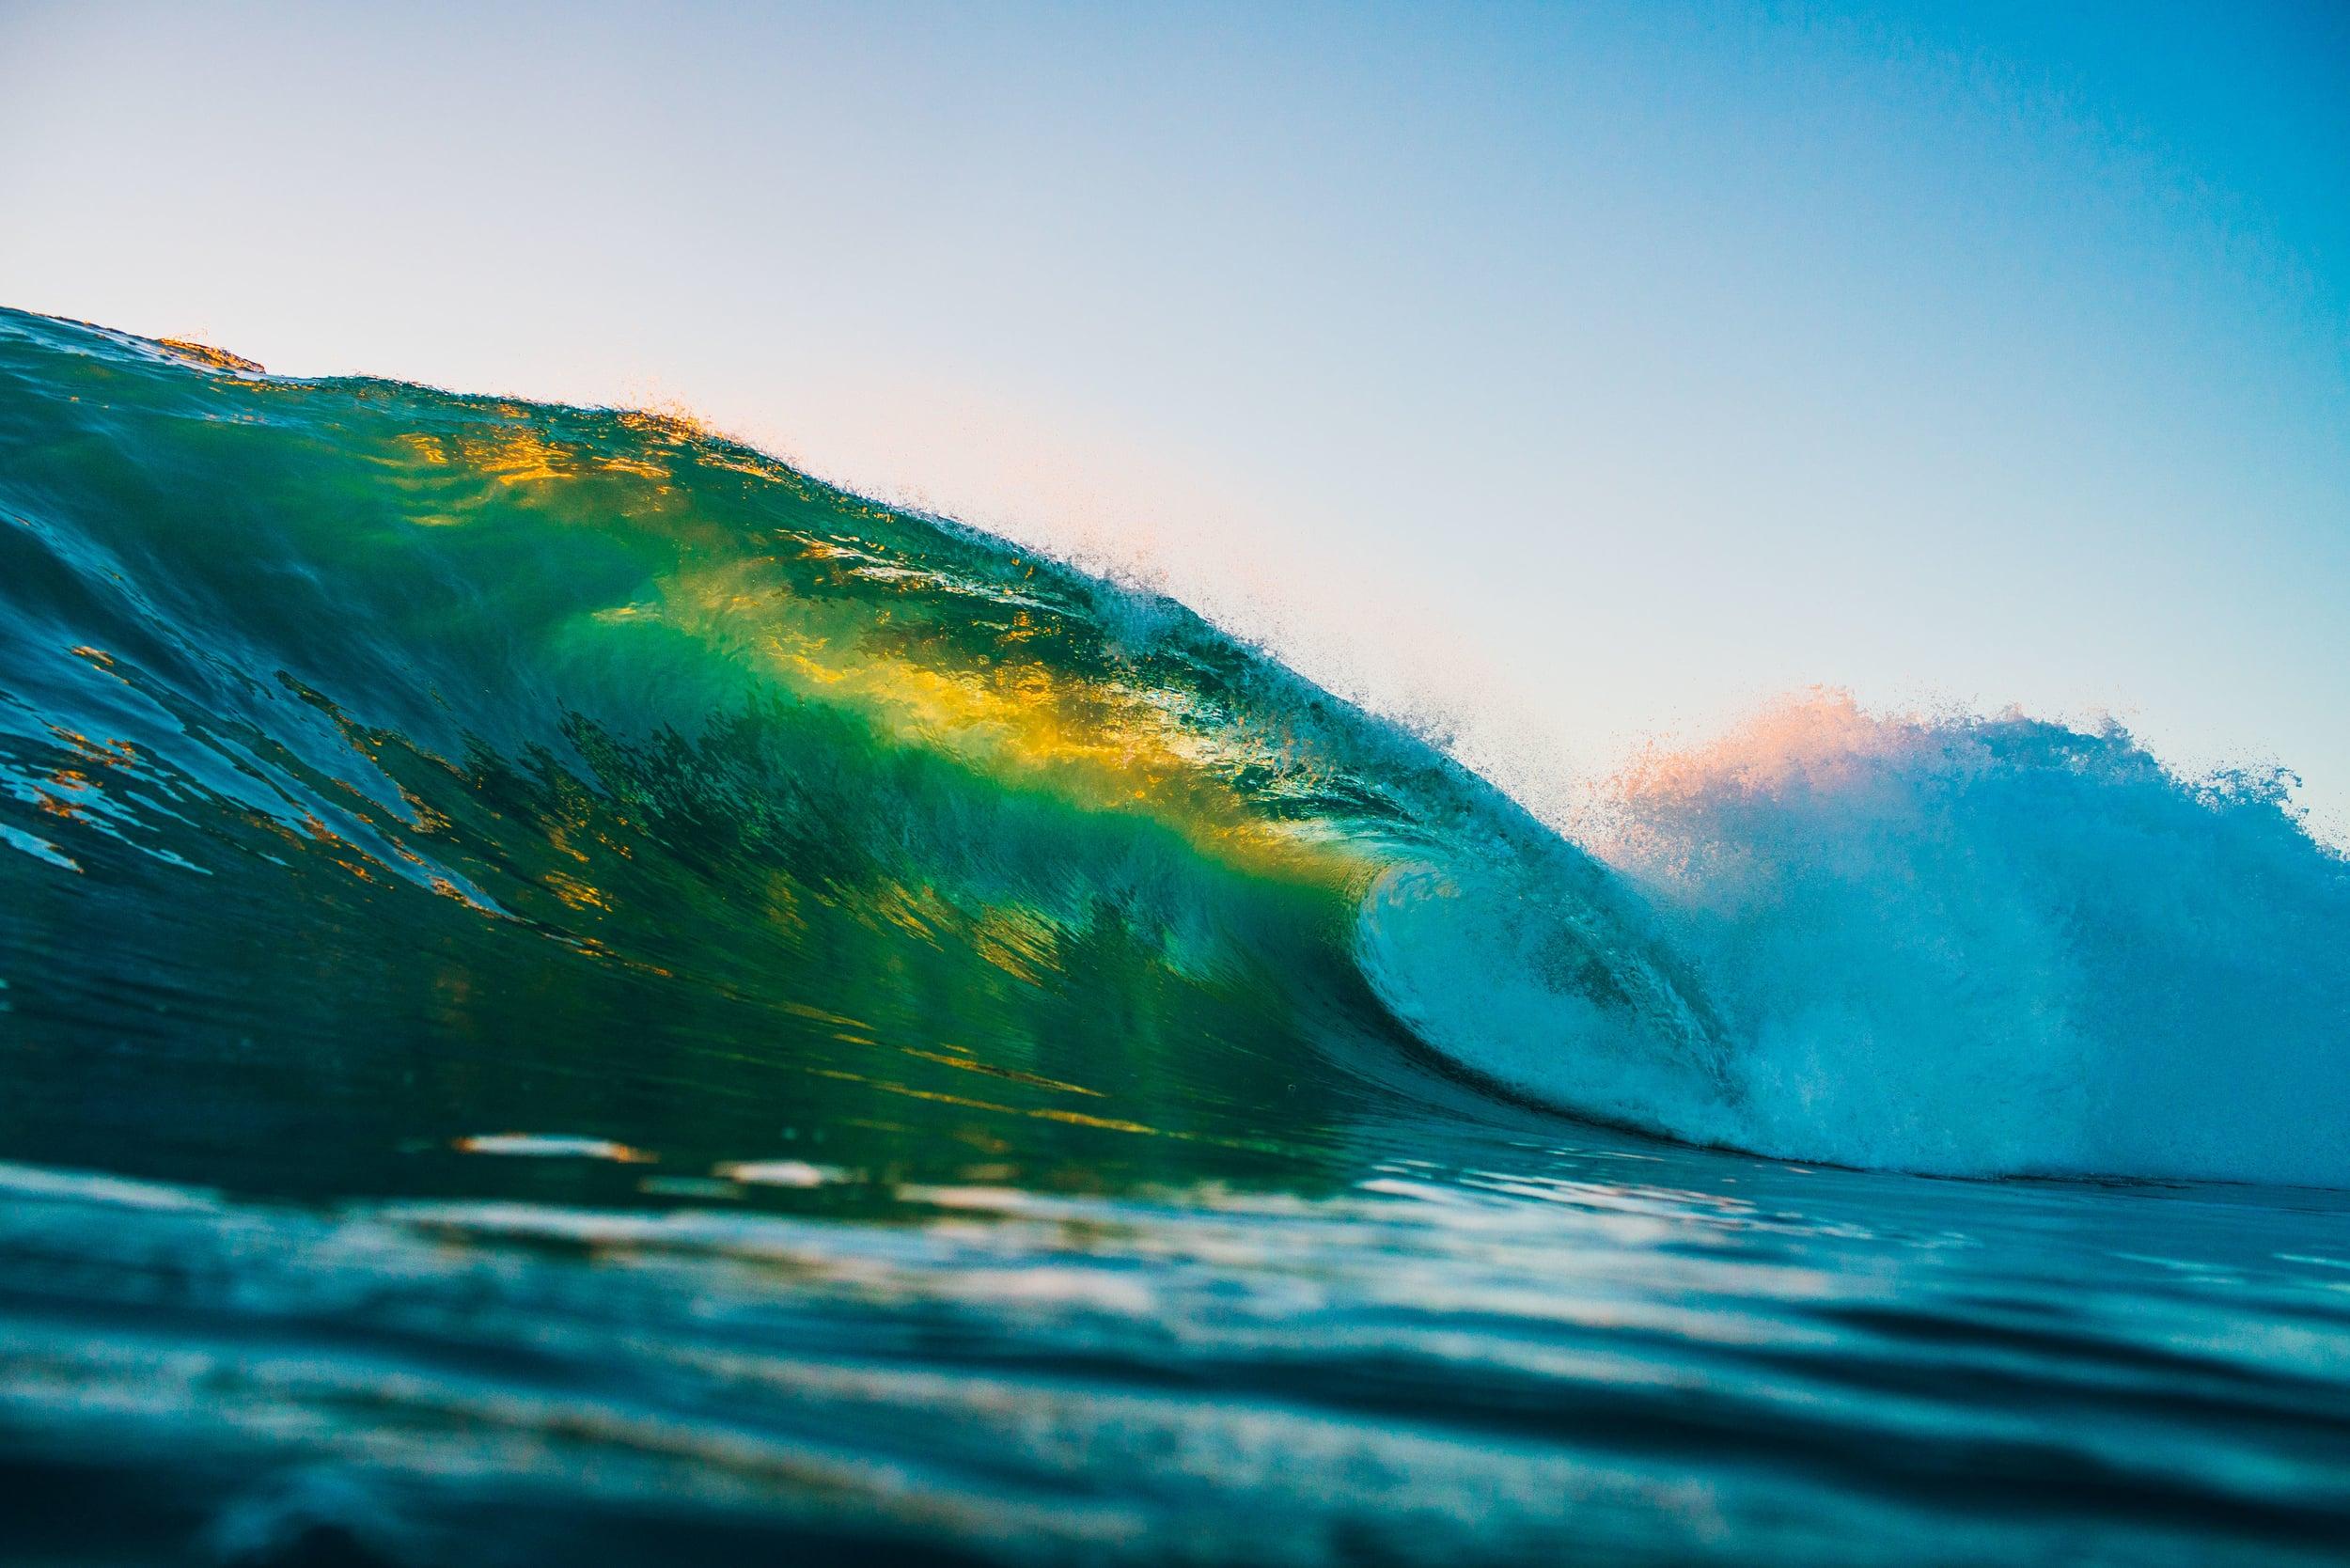 bryce-johnson-photography-kauai-hawaii-surfing-a7rii-aquatech-water-ocean-9.jpg